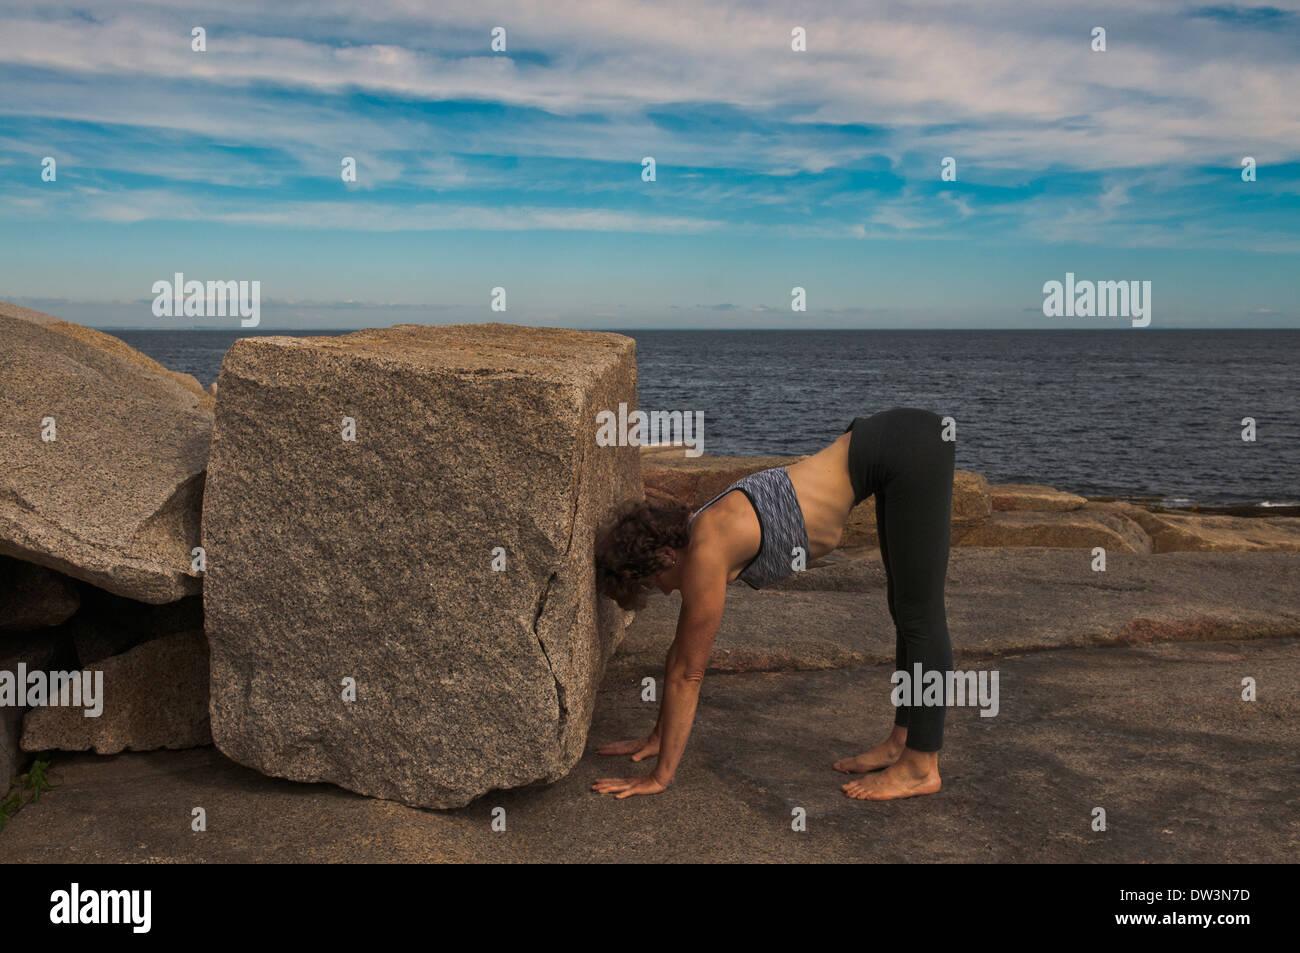 Iyengar Yoga Instructor Demonstrates Adho Mukha Vriksasana preparation (Inverted). Stock Photo